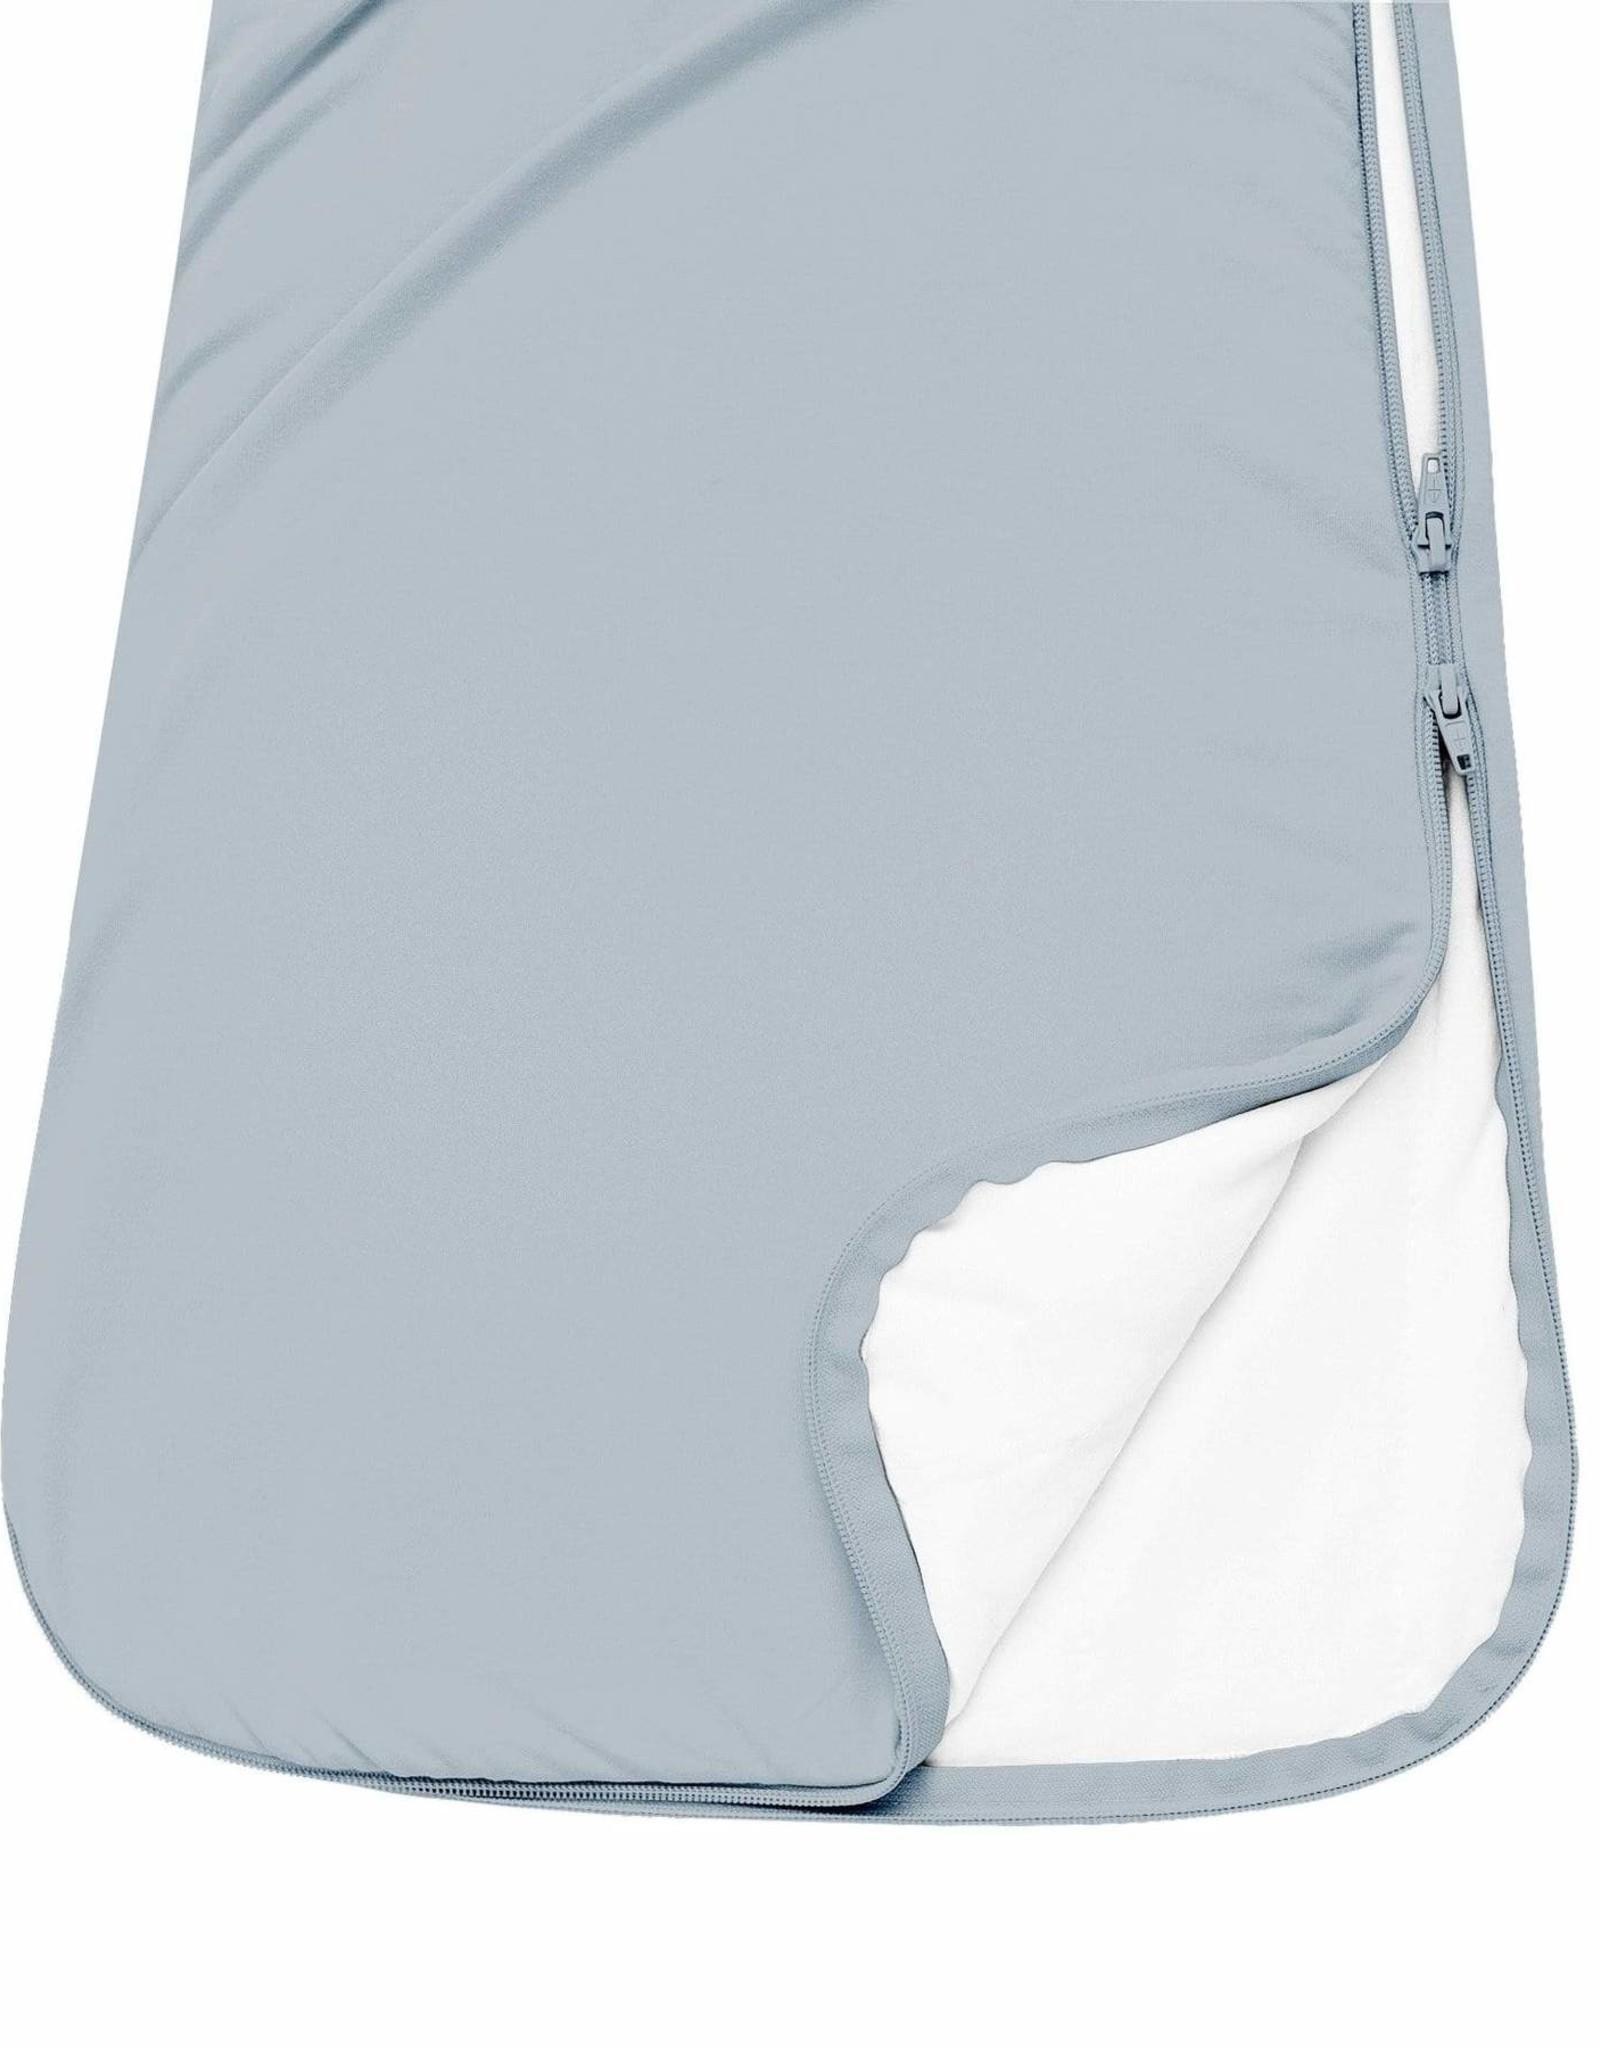 Kyte Baby sleep bag 1.0- fog